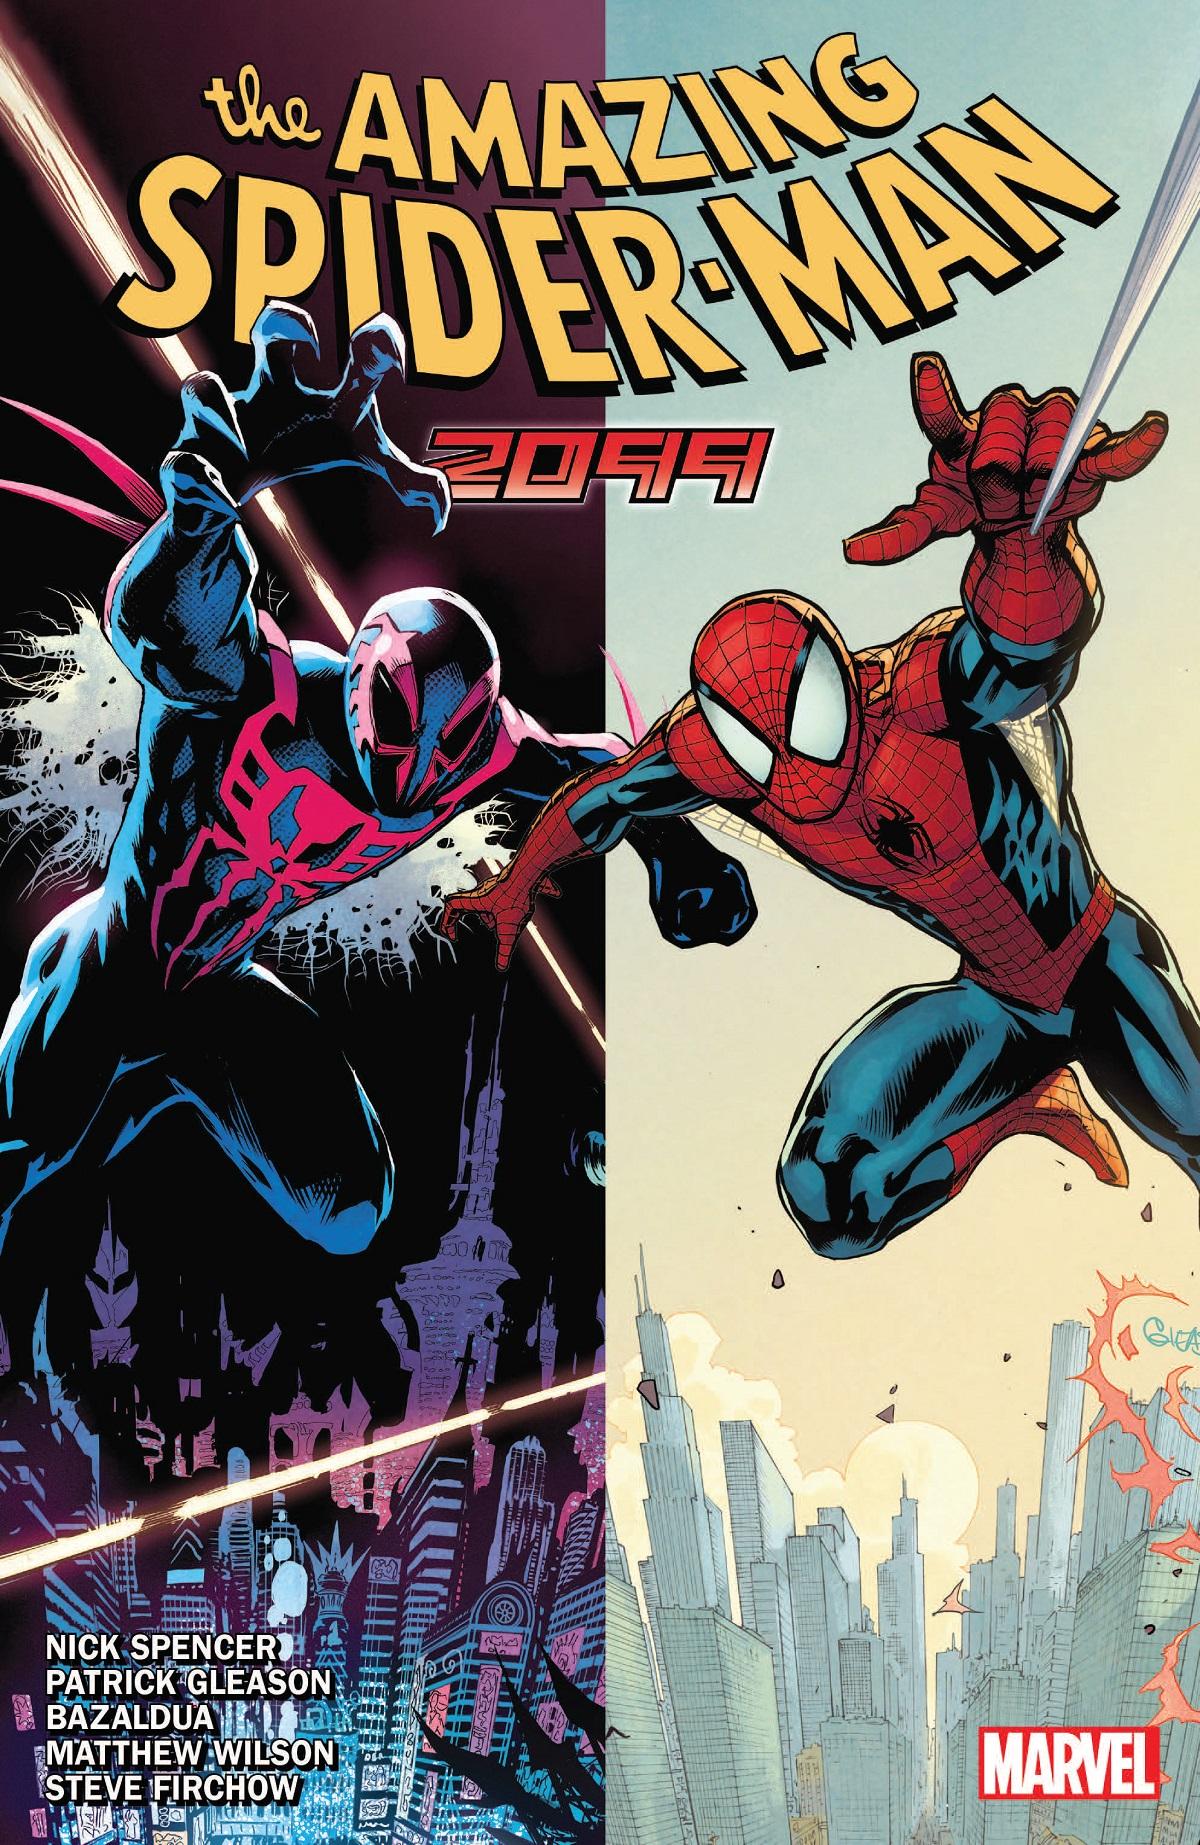 Amazing Spider-Man: 2099 Vol. 7 (Trade Paperback)